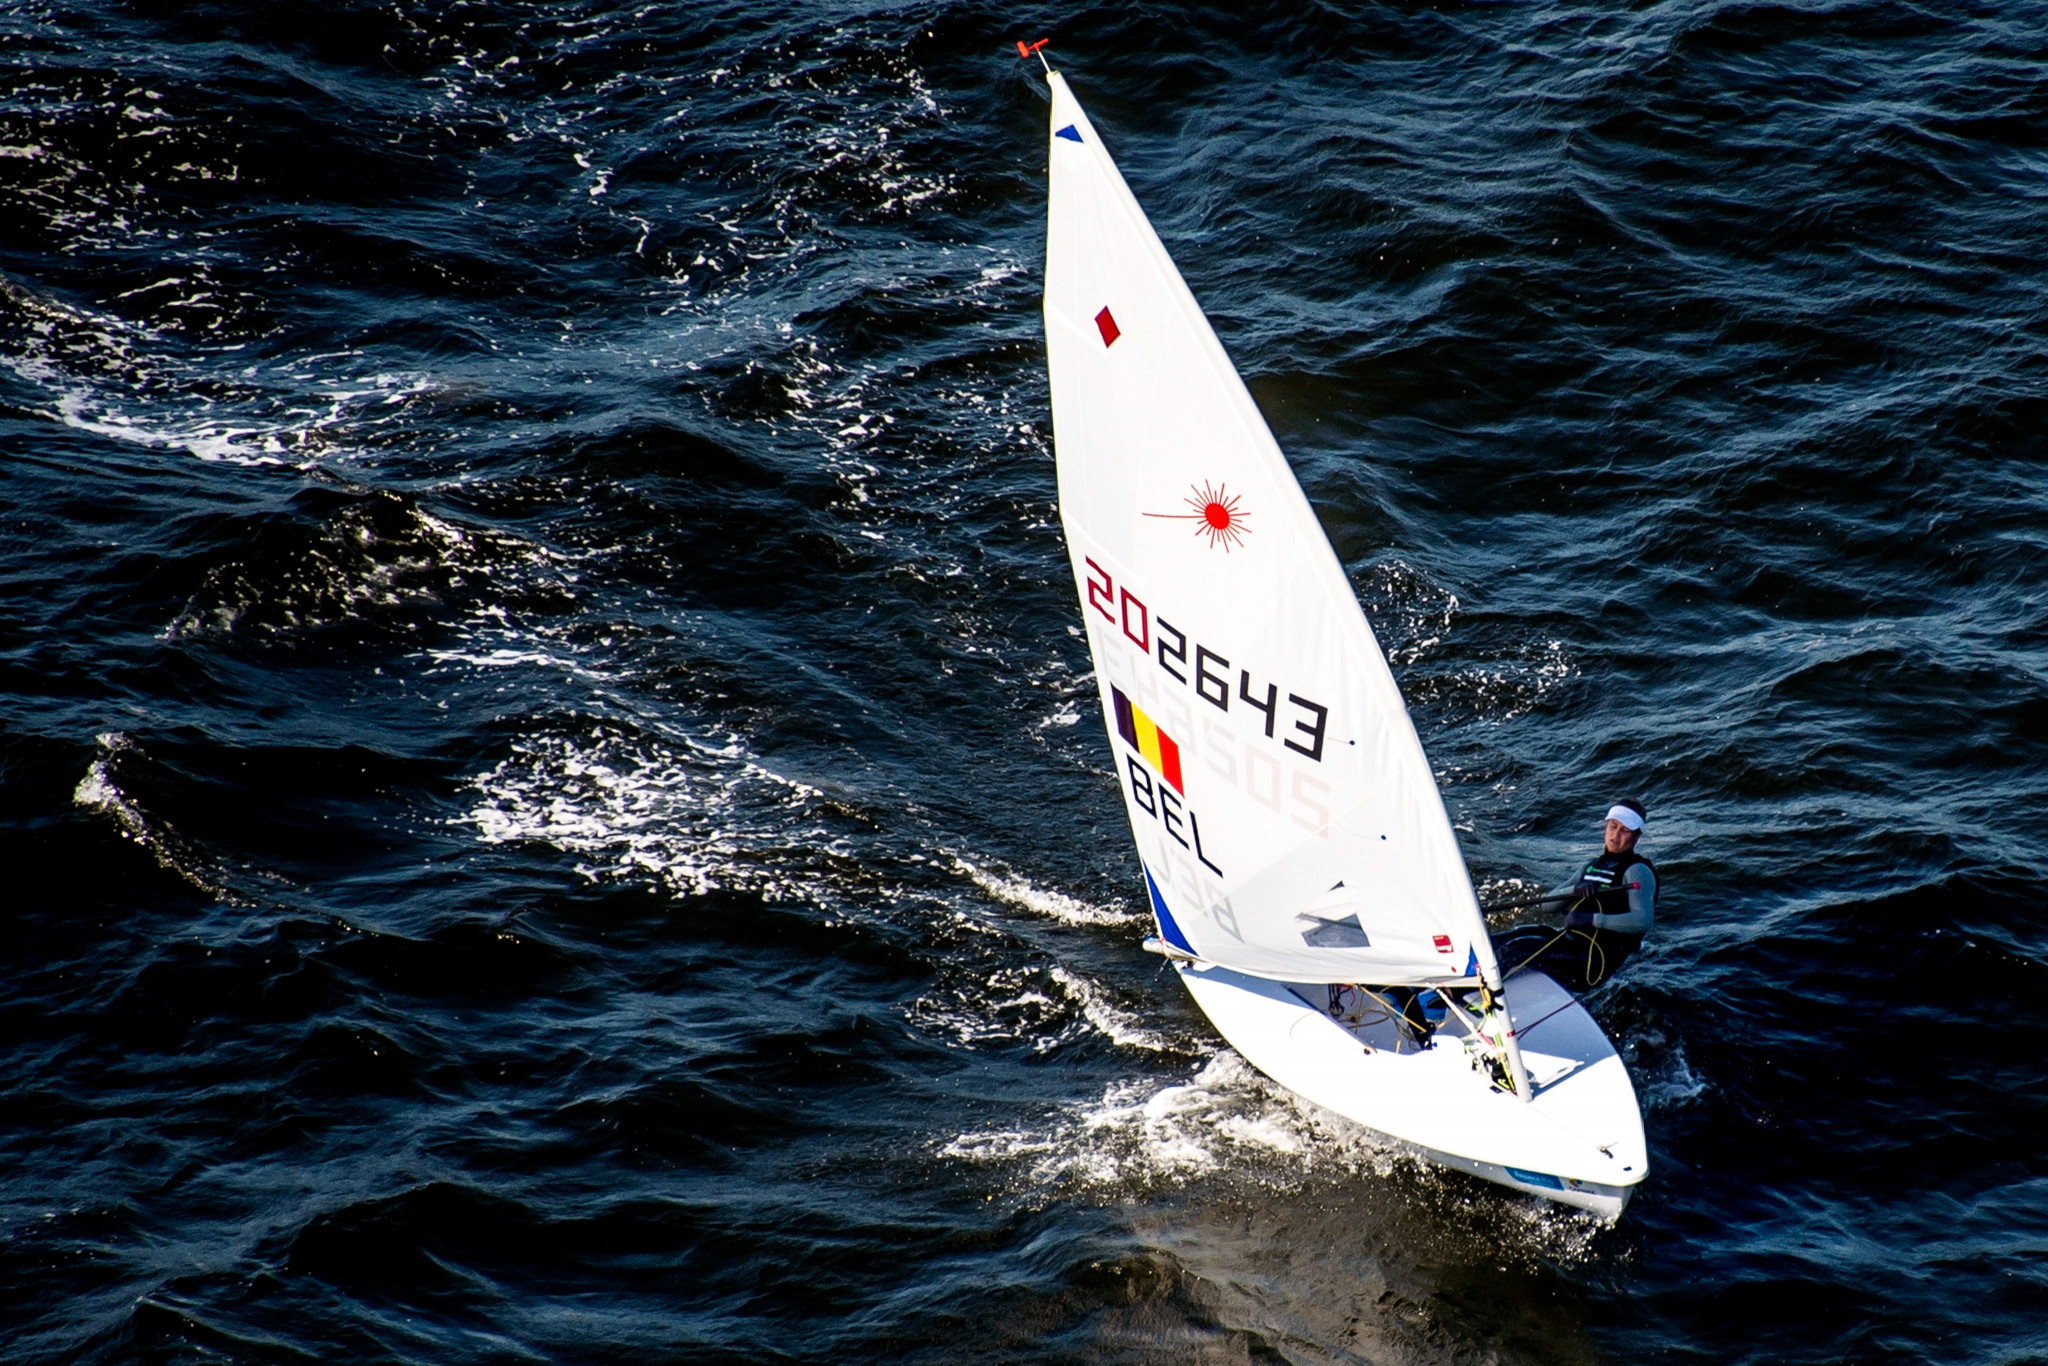 World champion Emma Plasschaert will go for gold in the laser radial fleet ©Getty Images